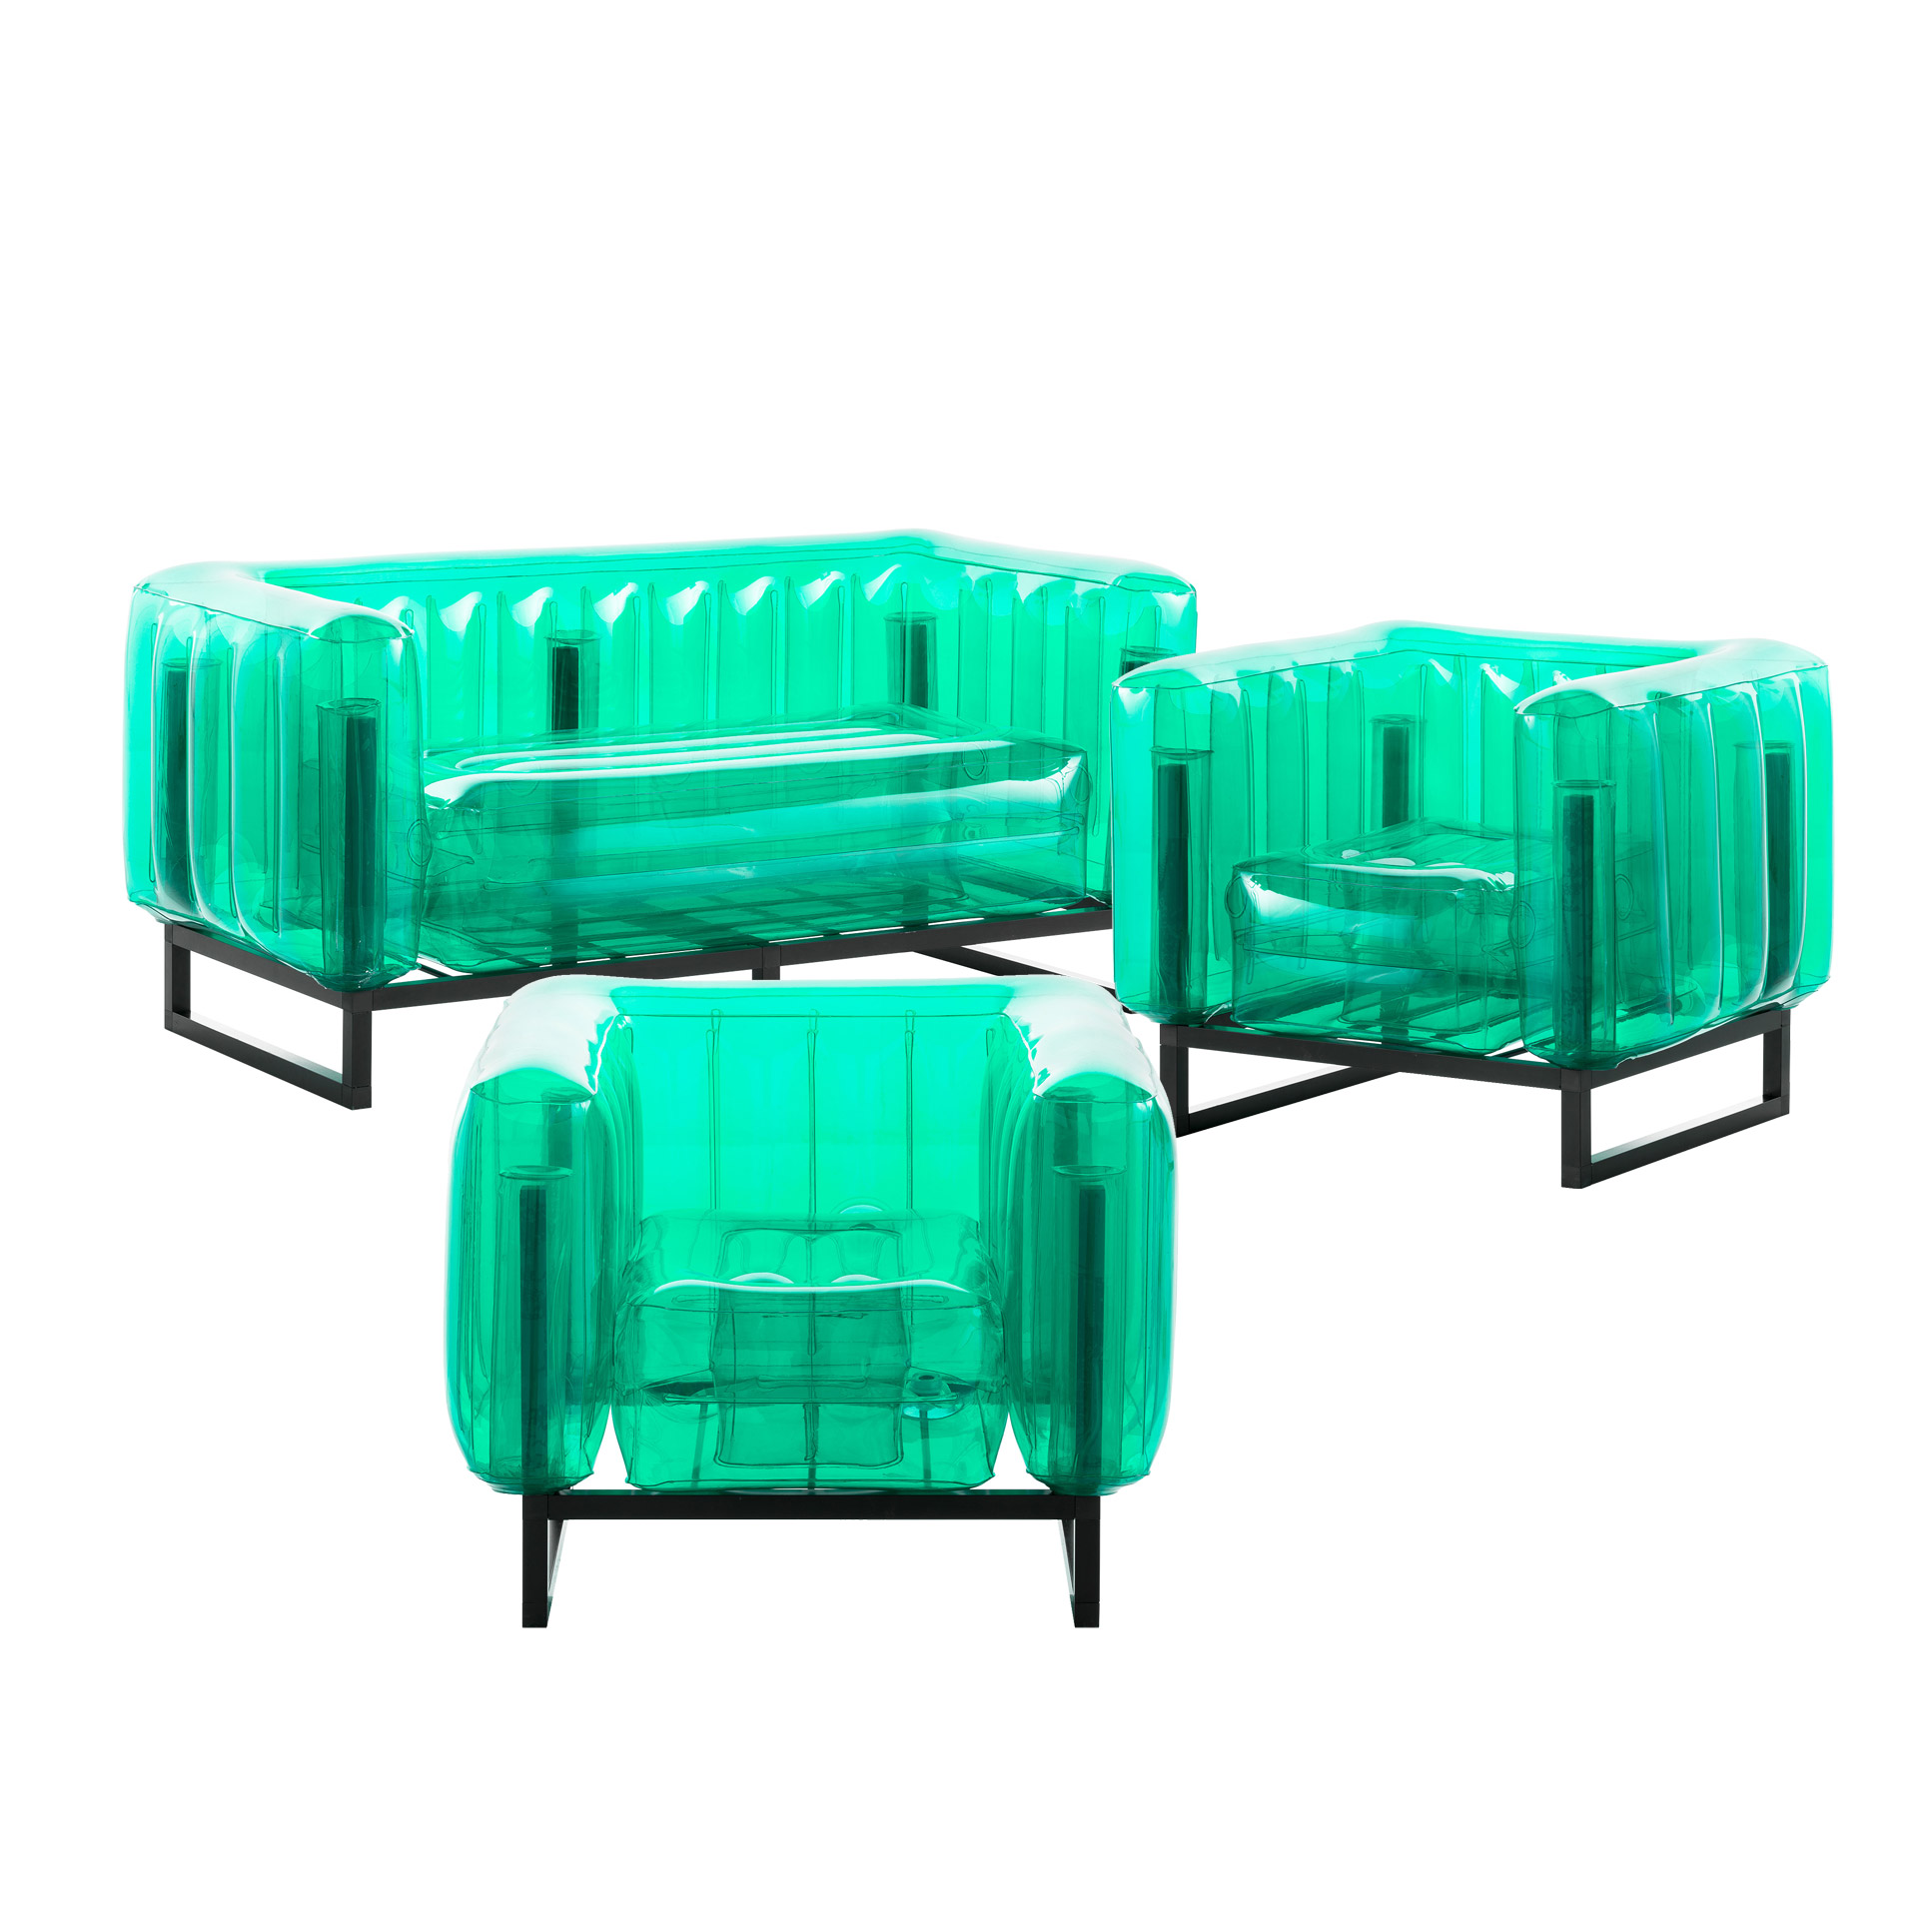 Salon de jardin design 1 canapé et 2 fauteuils verts cadre aluminium